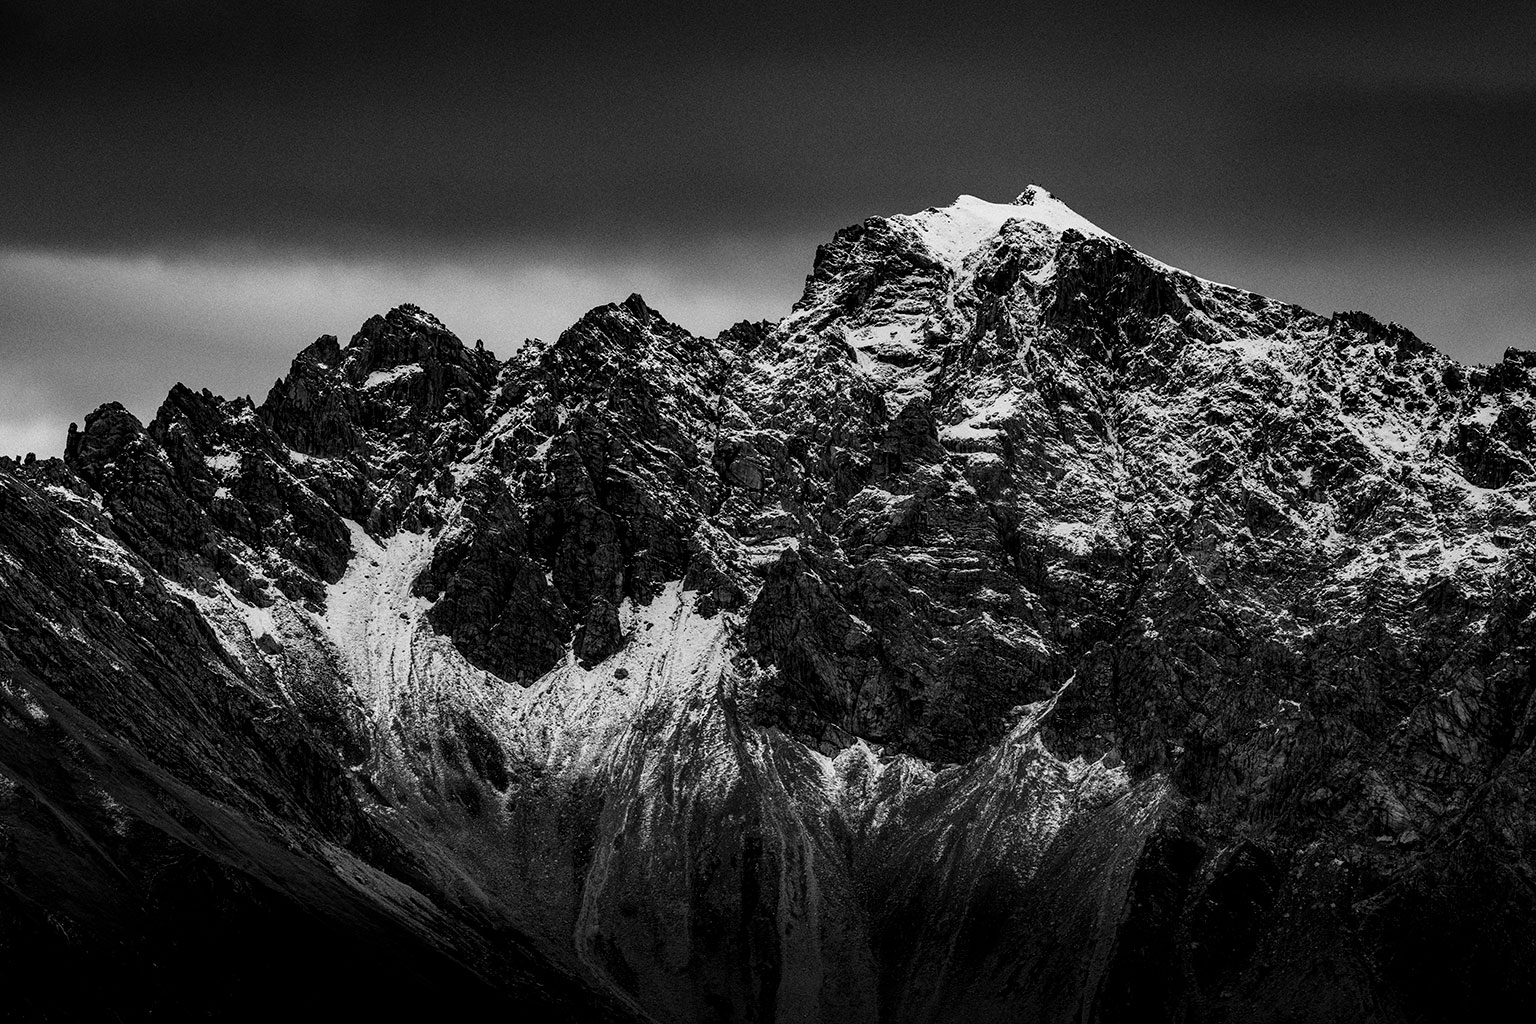 Harry_Koester_Alpen_Fotografie_Landschaft_02